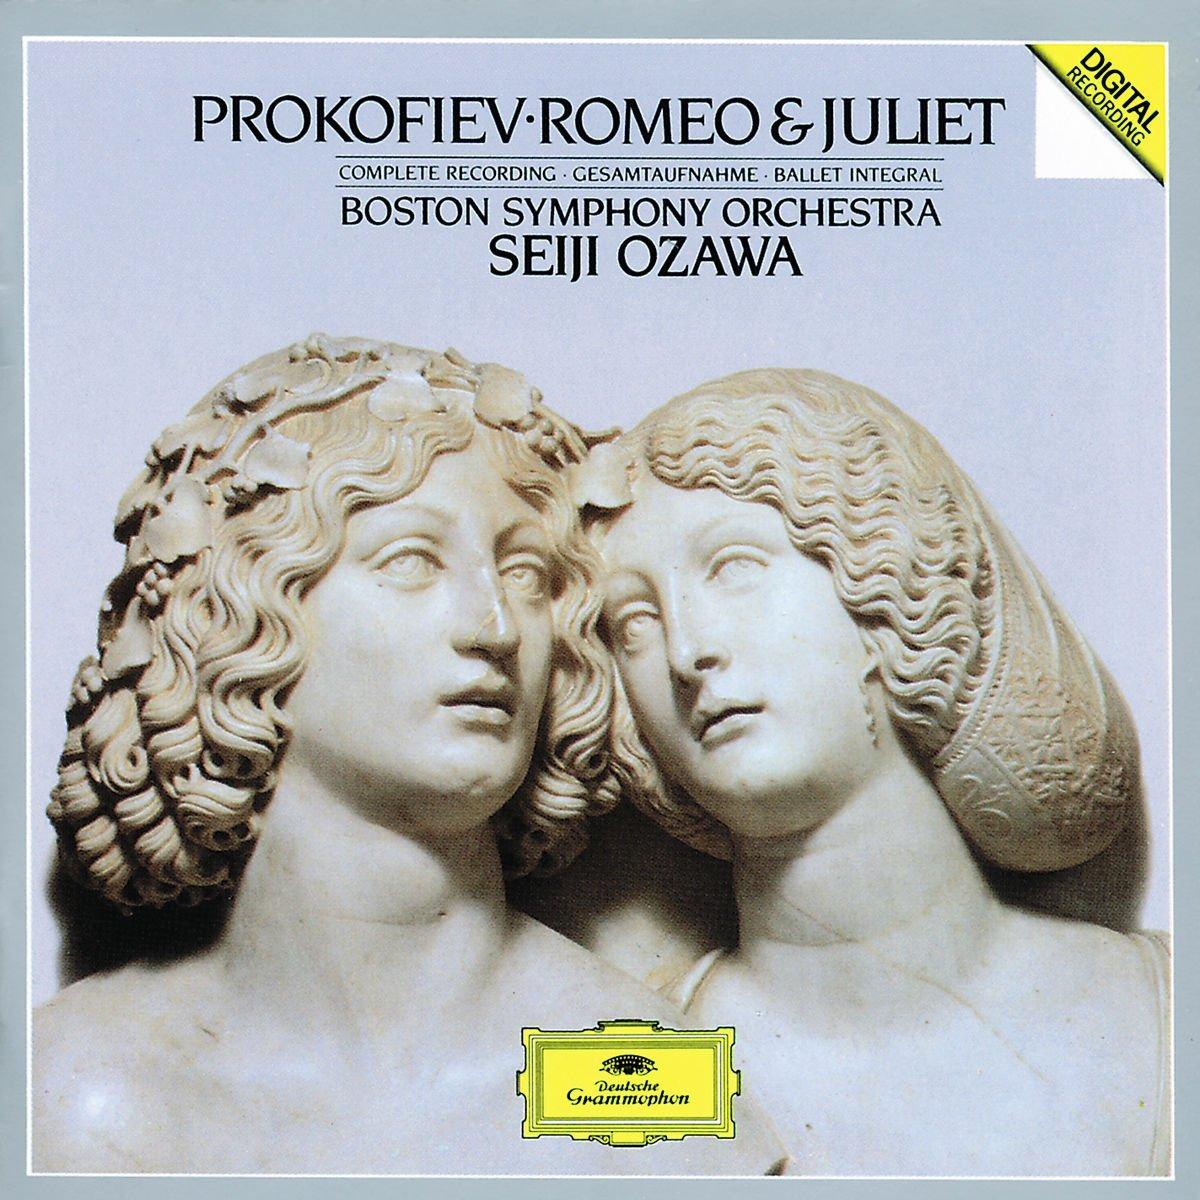 Seiji Ozawa. Prokofiev. Romeo & Juliet, op.64 (2 CD) yulianna avdeeva chopin schubert prokofiev 2 cd